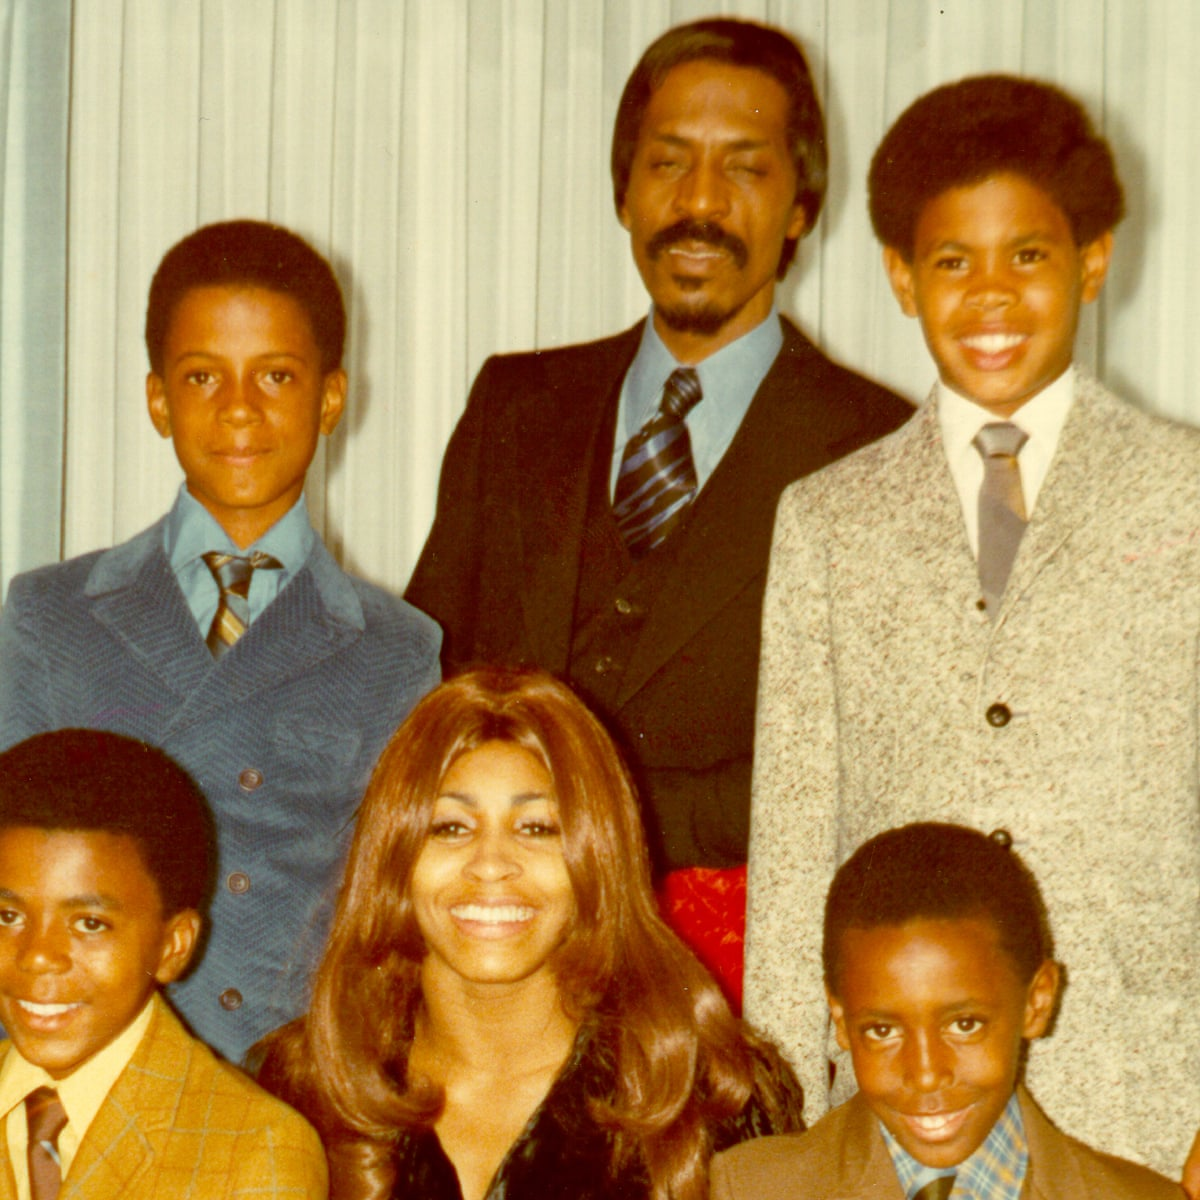 Craig Raymond Turner Eldest Son Of Tina Turner Dies From Gunshot Wound Tina Turner The Guardian